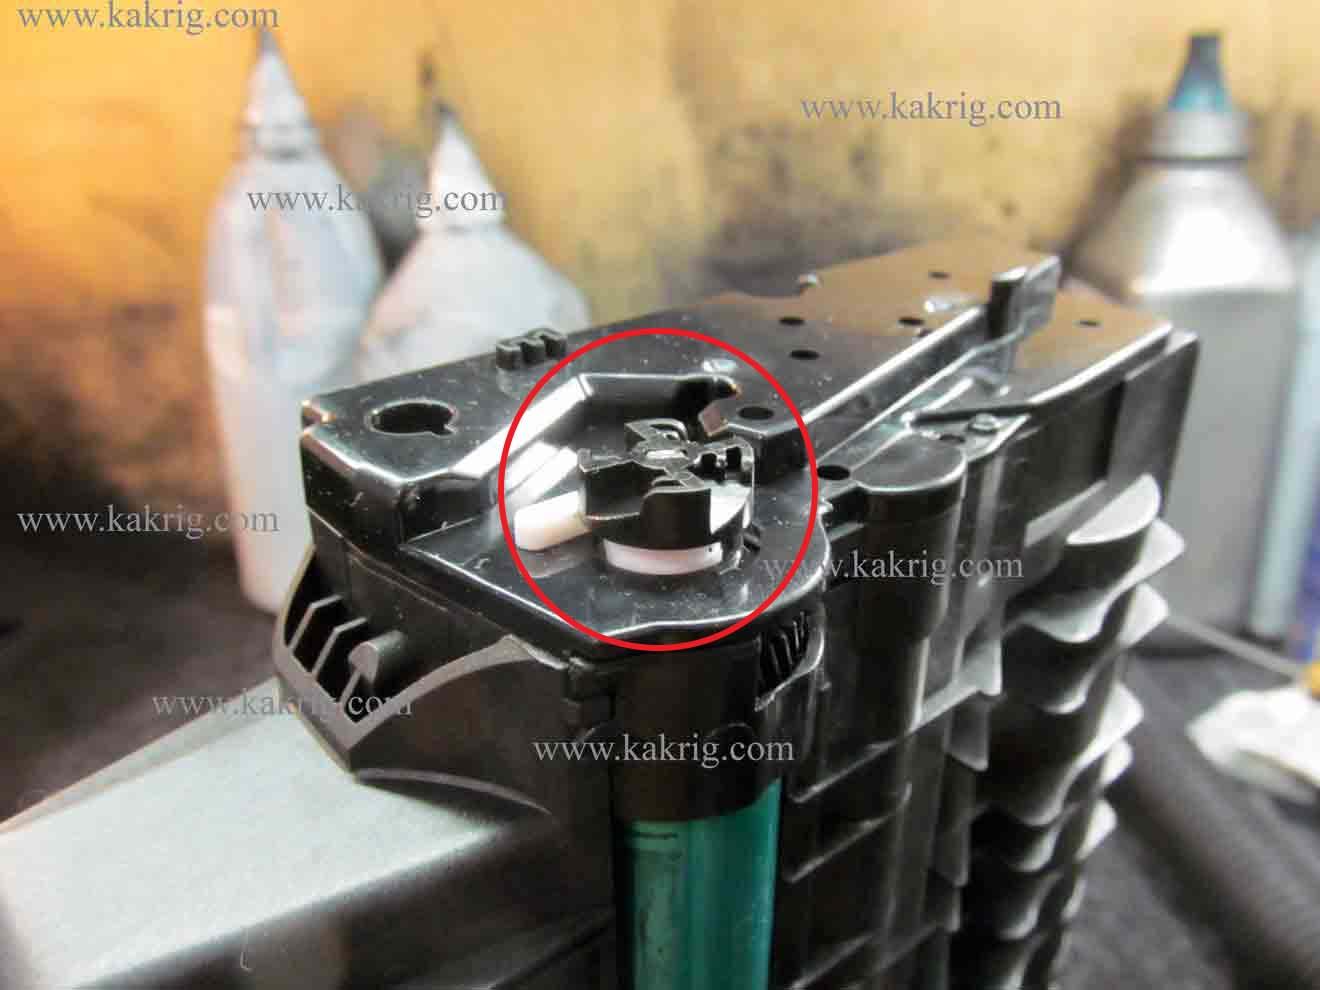 инструкция по разборке мфу samsung scx-4220